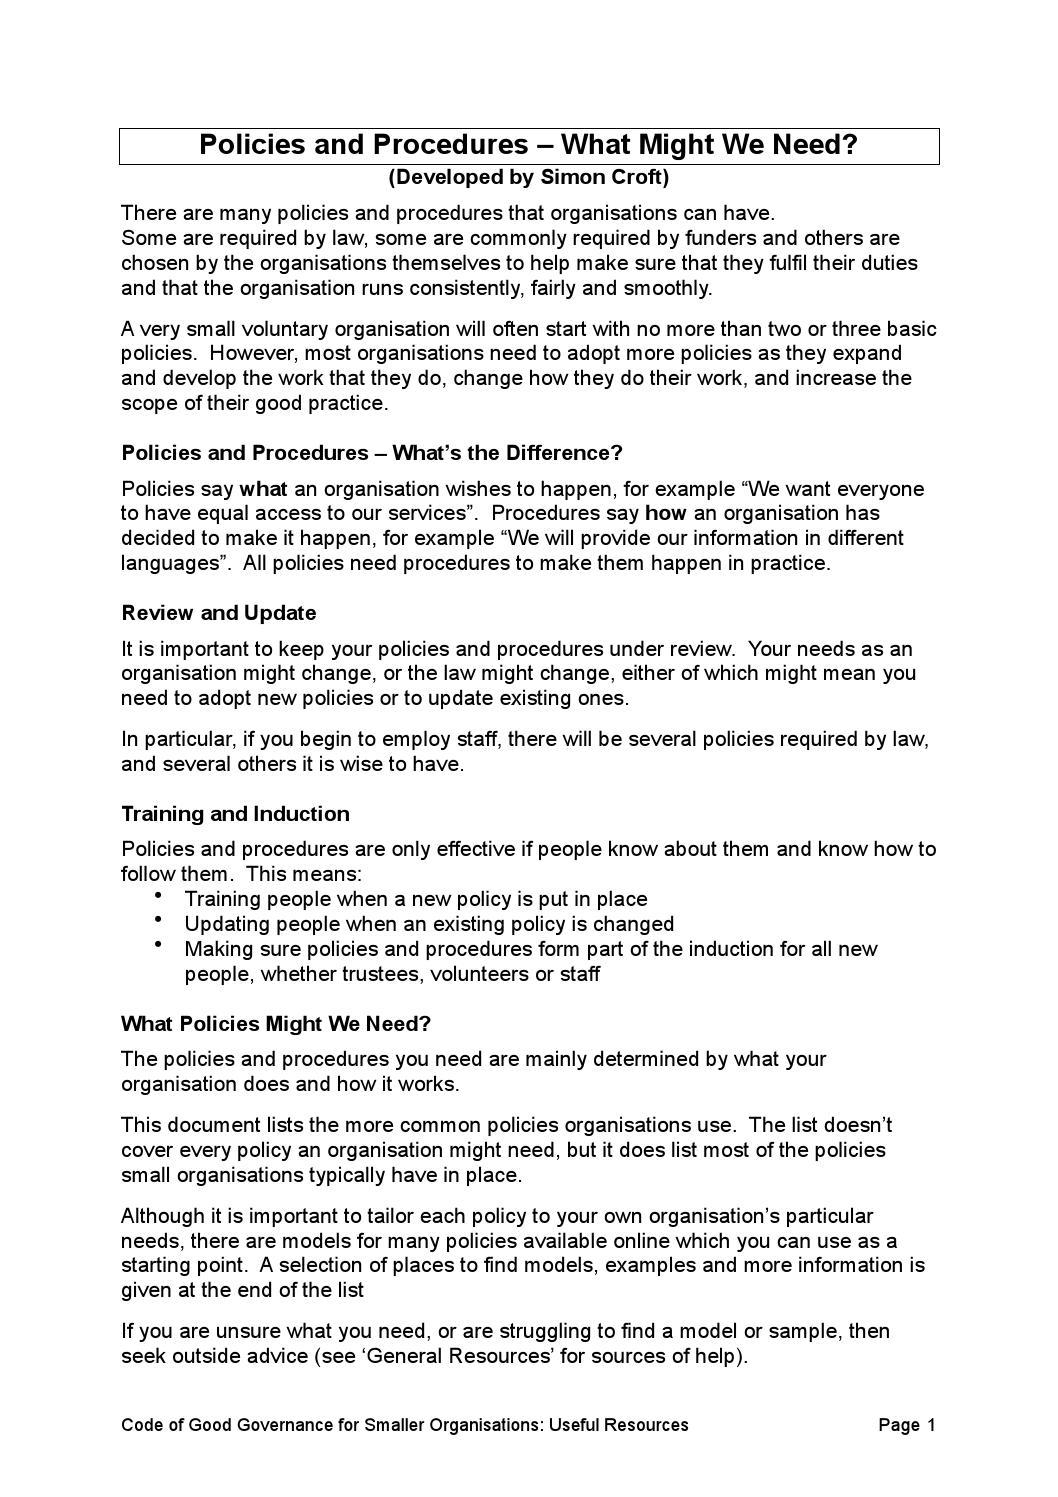 principle-4-resource-2-policies-and-procedures by Sam